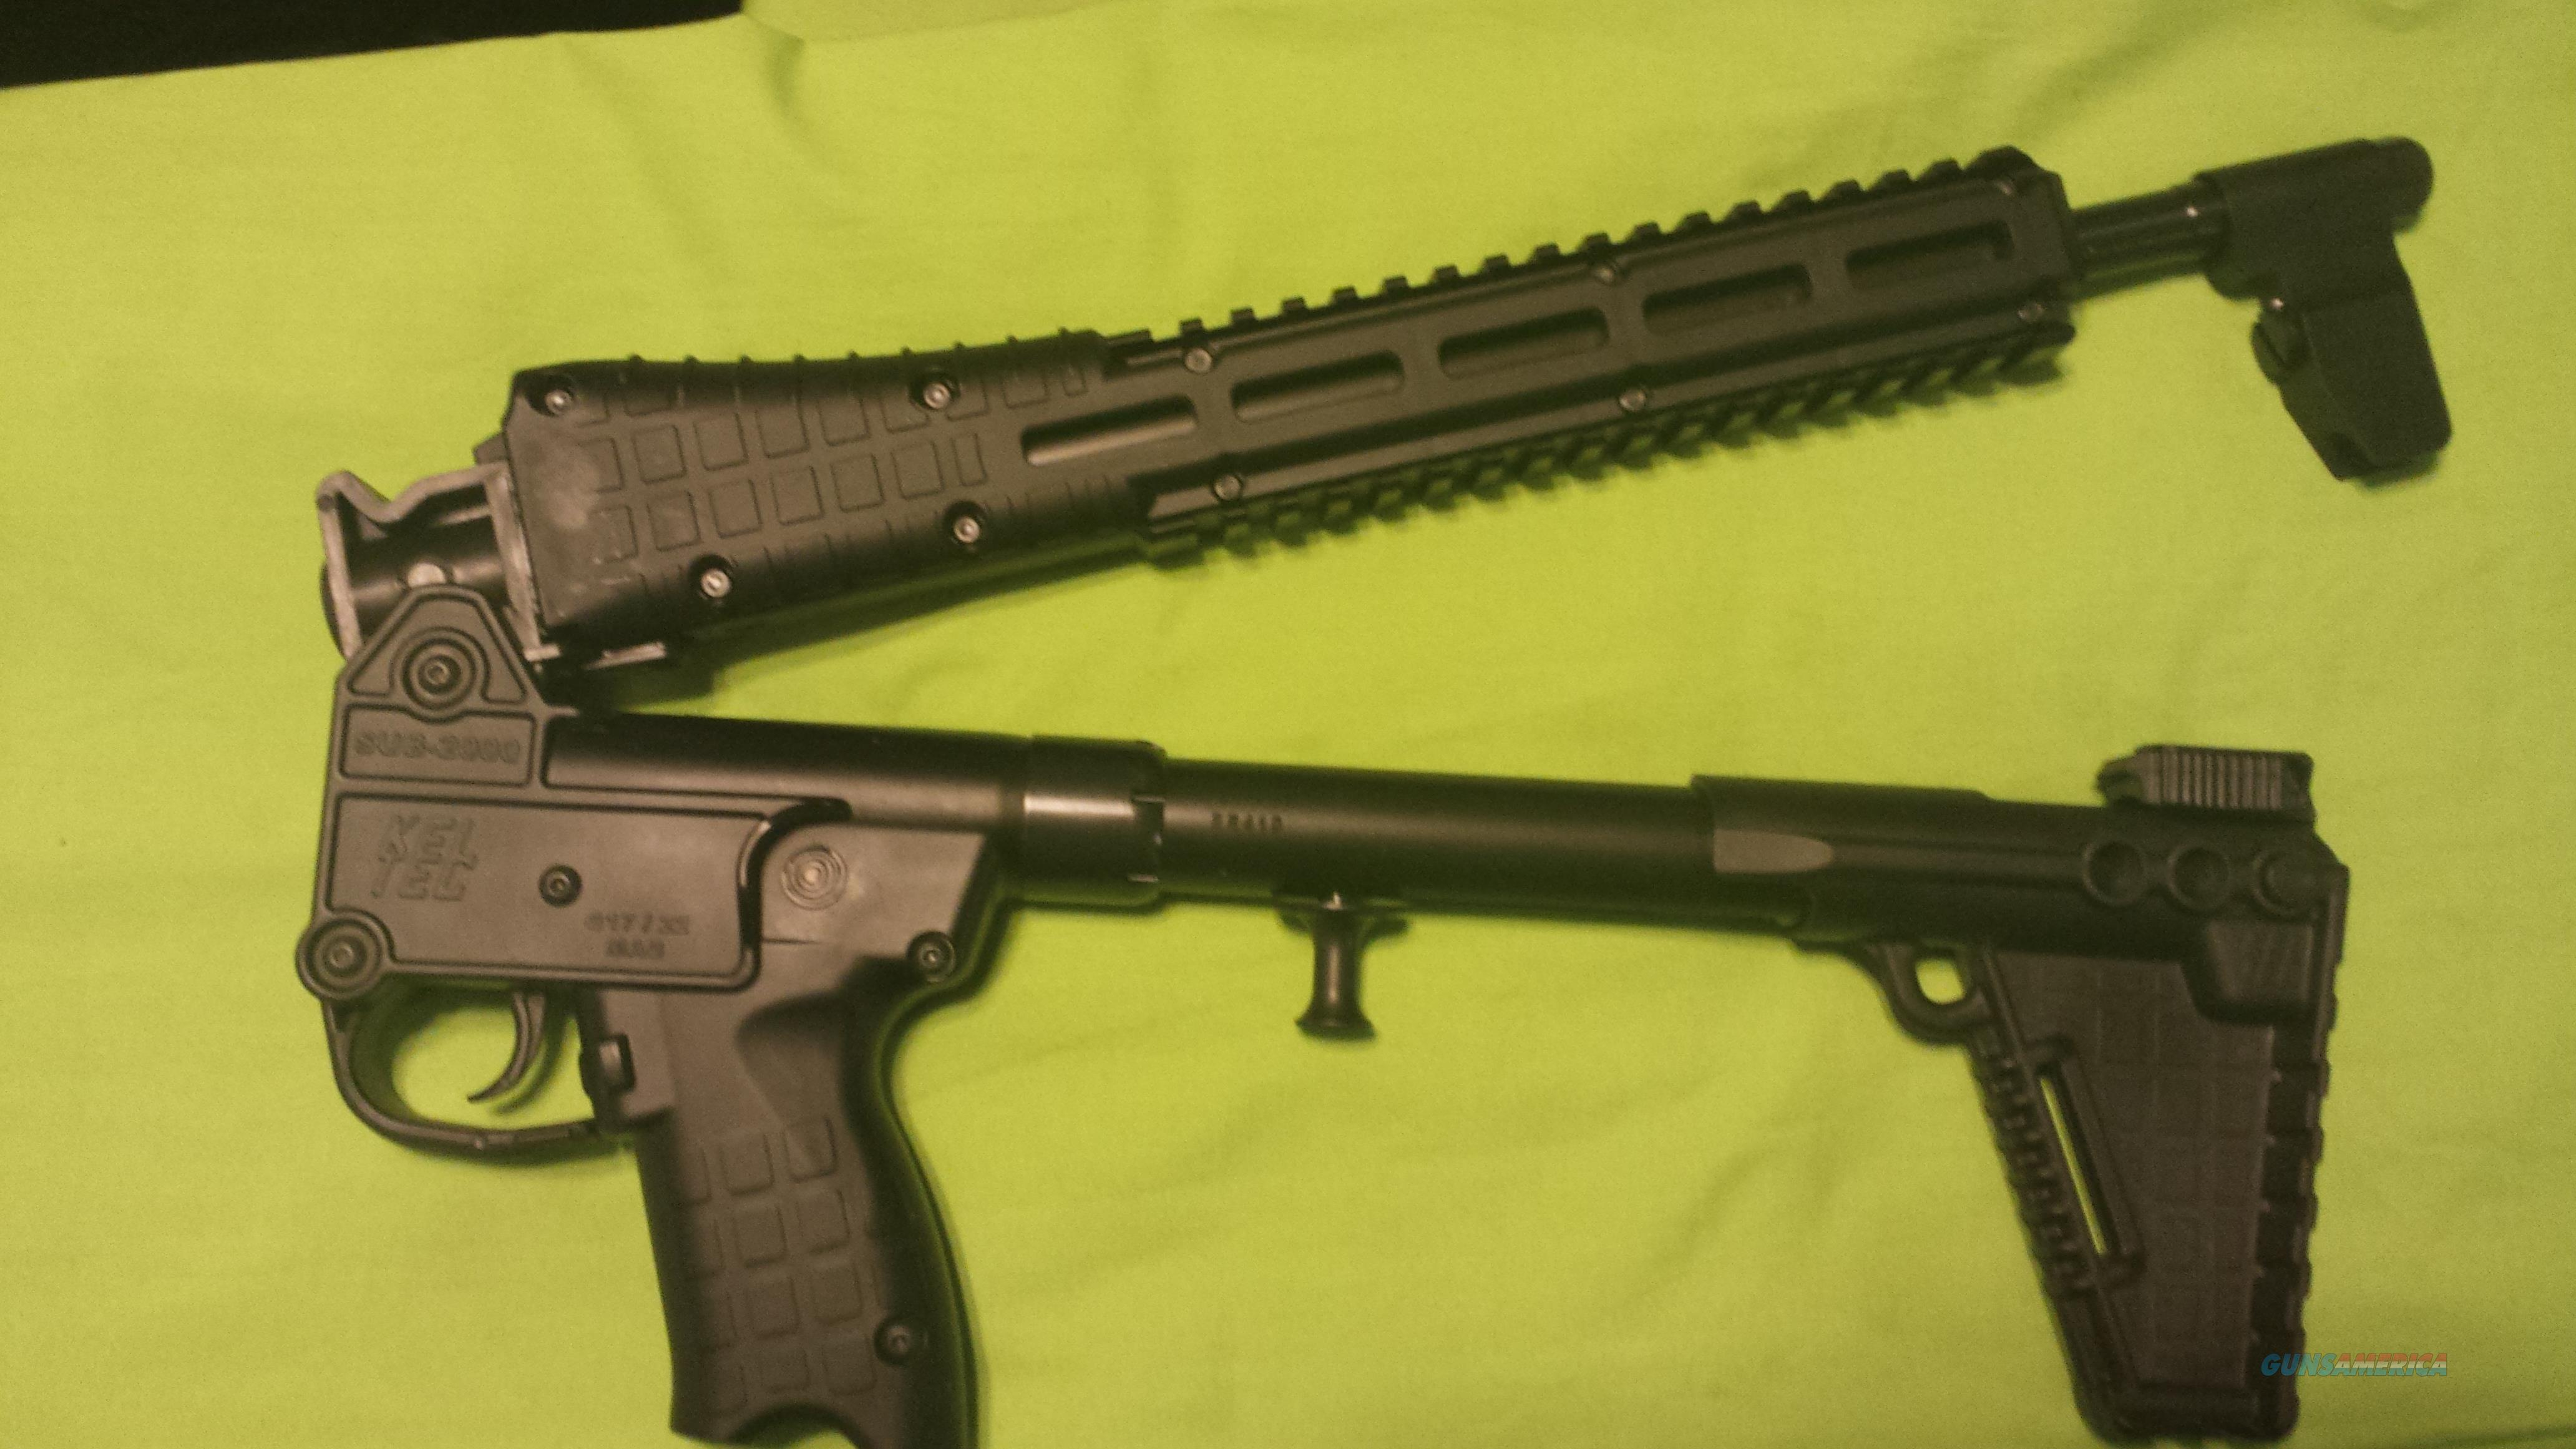 KEL TEC SUB 2K 2000 G2 GEN 2 9MM GLOCK 17 17RD BLK  Guns > Rifles > Kel-Tec Rifles